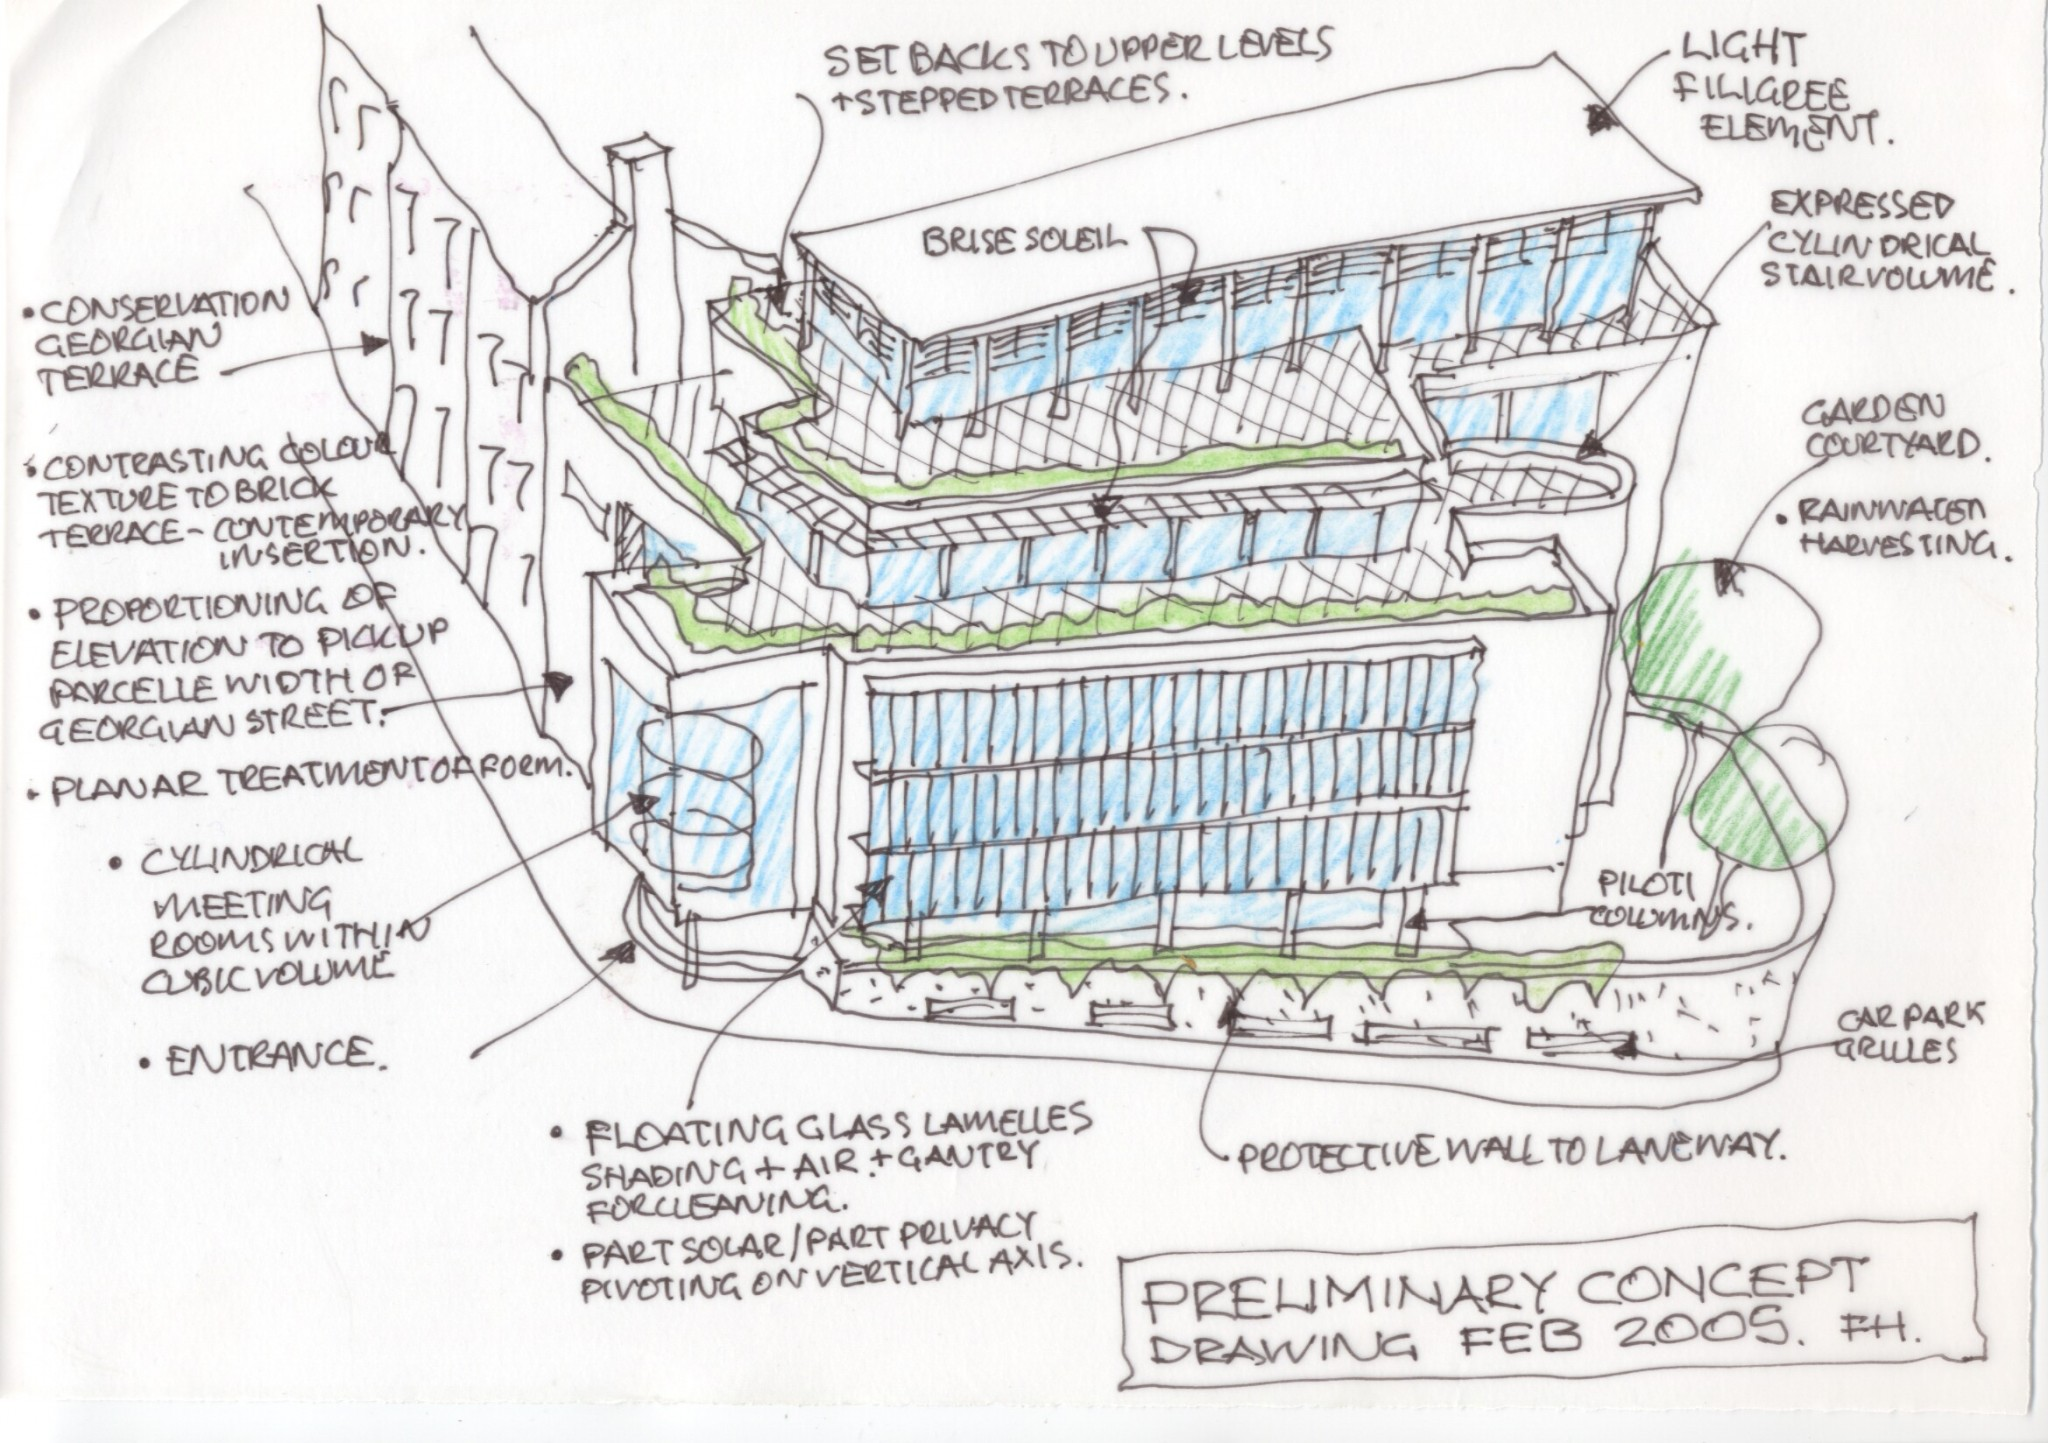 20 on Hatch Preliminary Concept Sketch